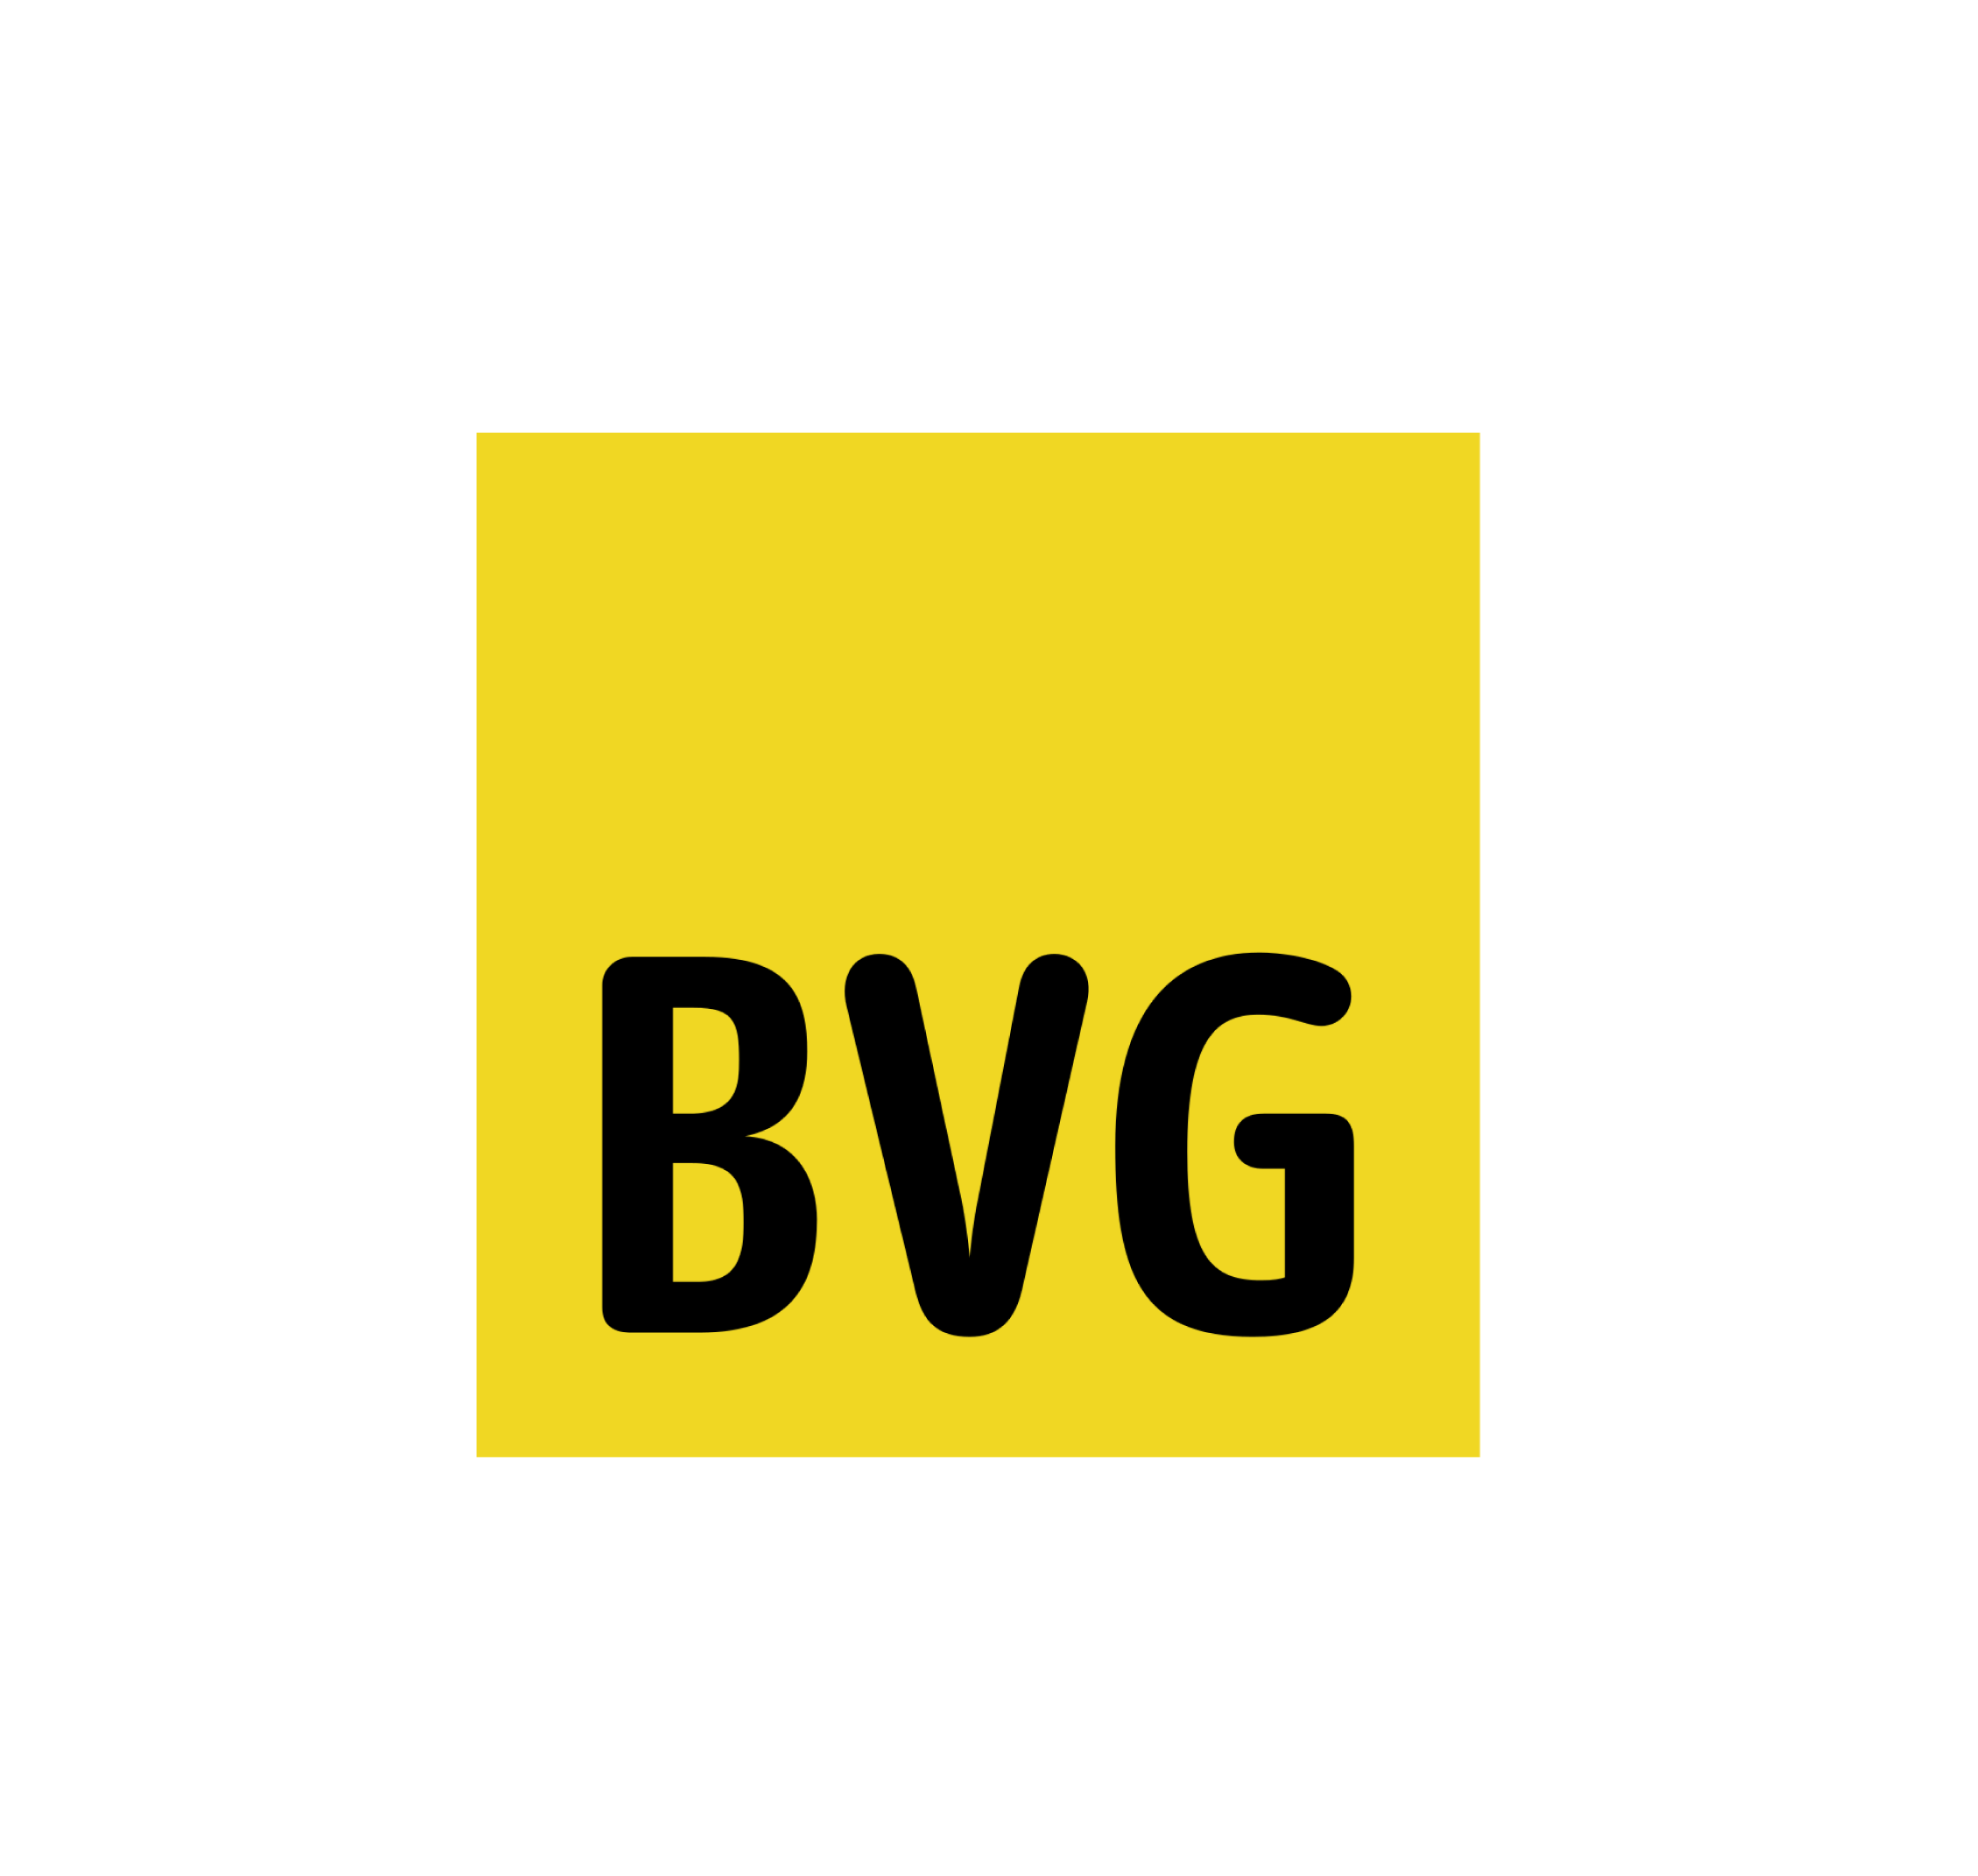 Bvg-logo_5